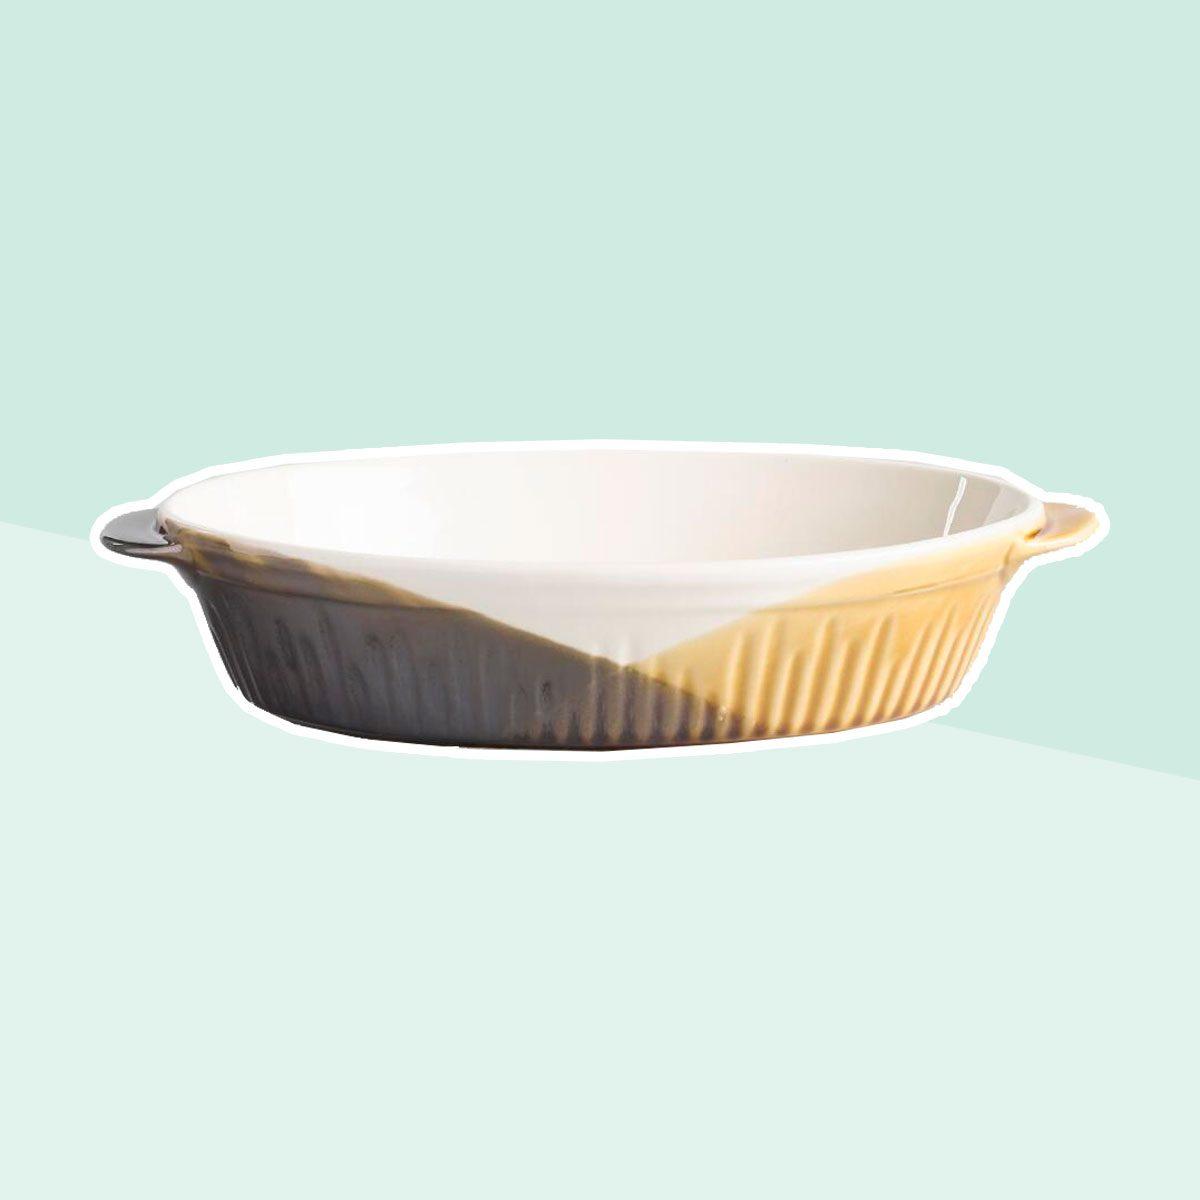 Oval Reactive Glaze Ceramic Baker